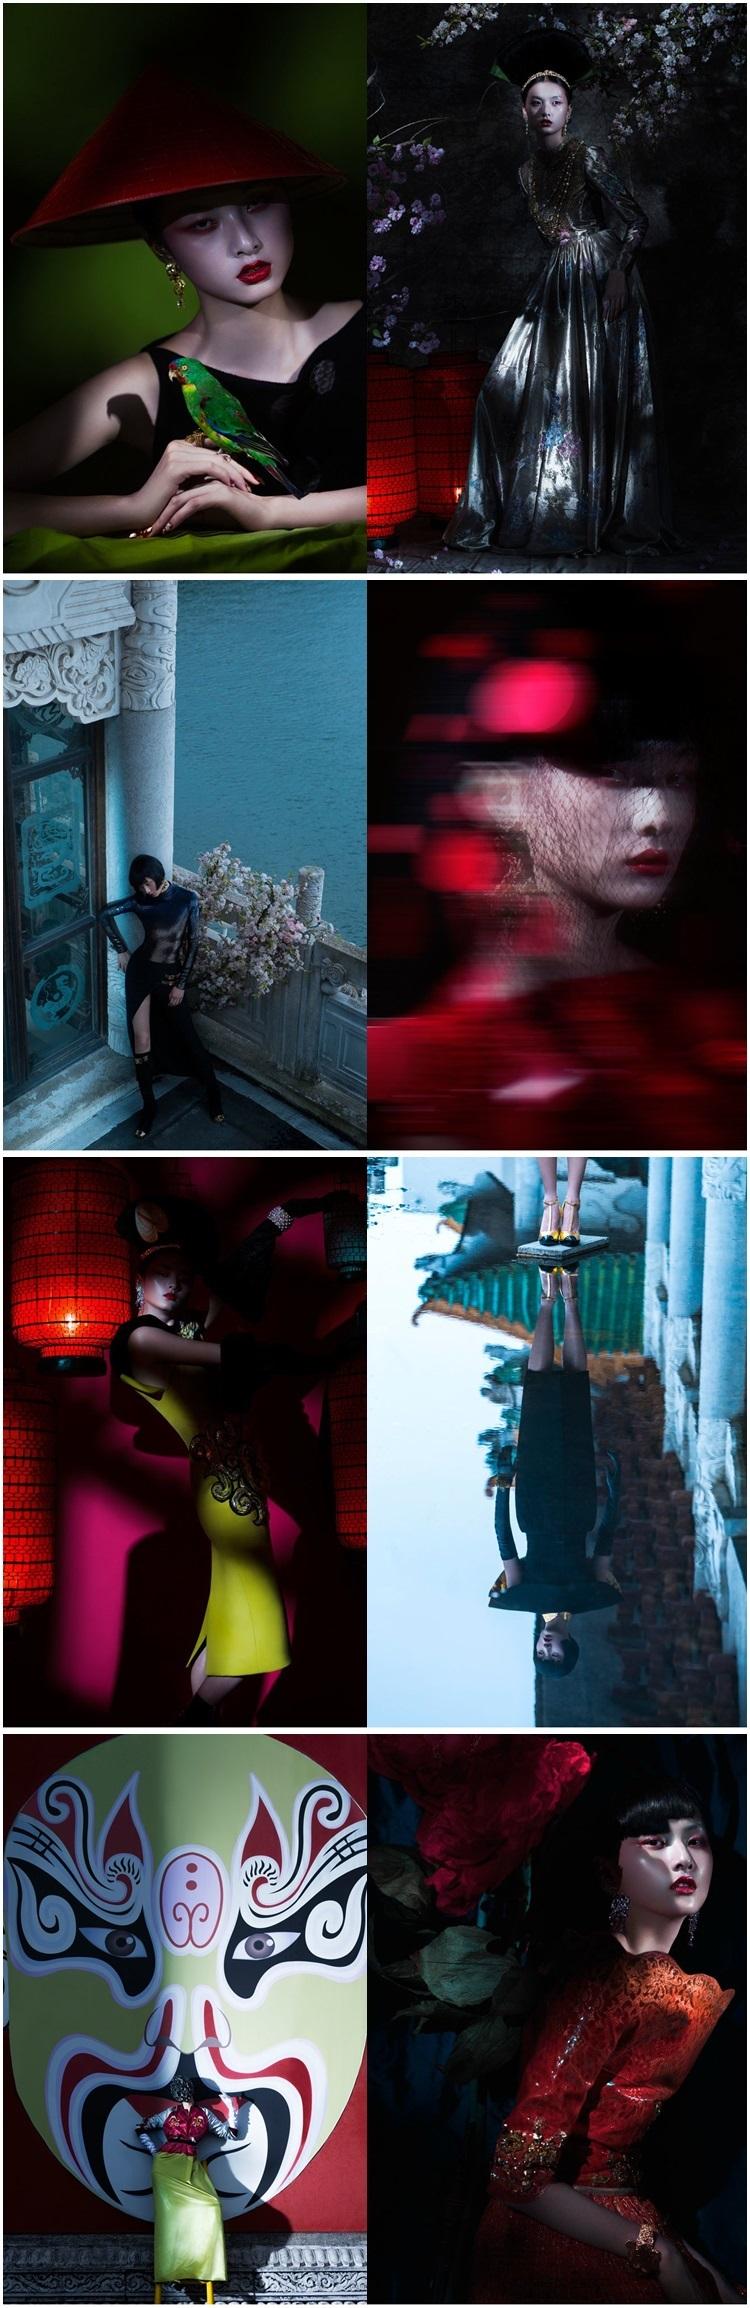 china-couture-fashion4addicts